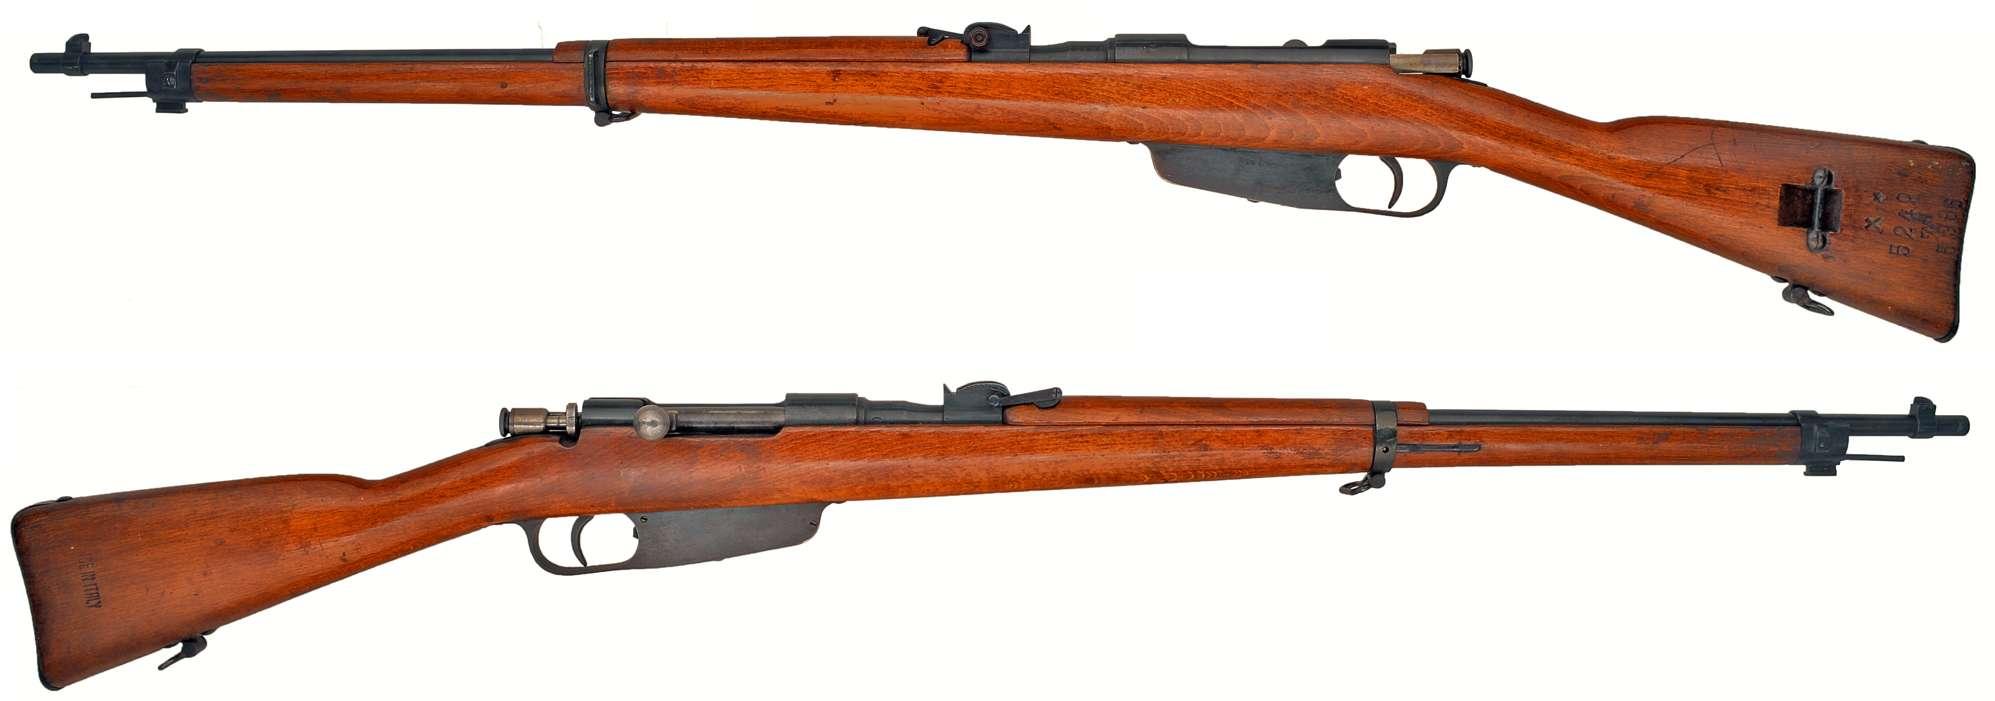 Italian-Rifle-Carcano-M1941-sides_2018-08-12-2.jpg